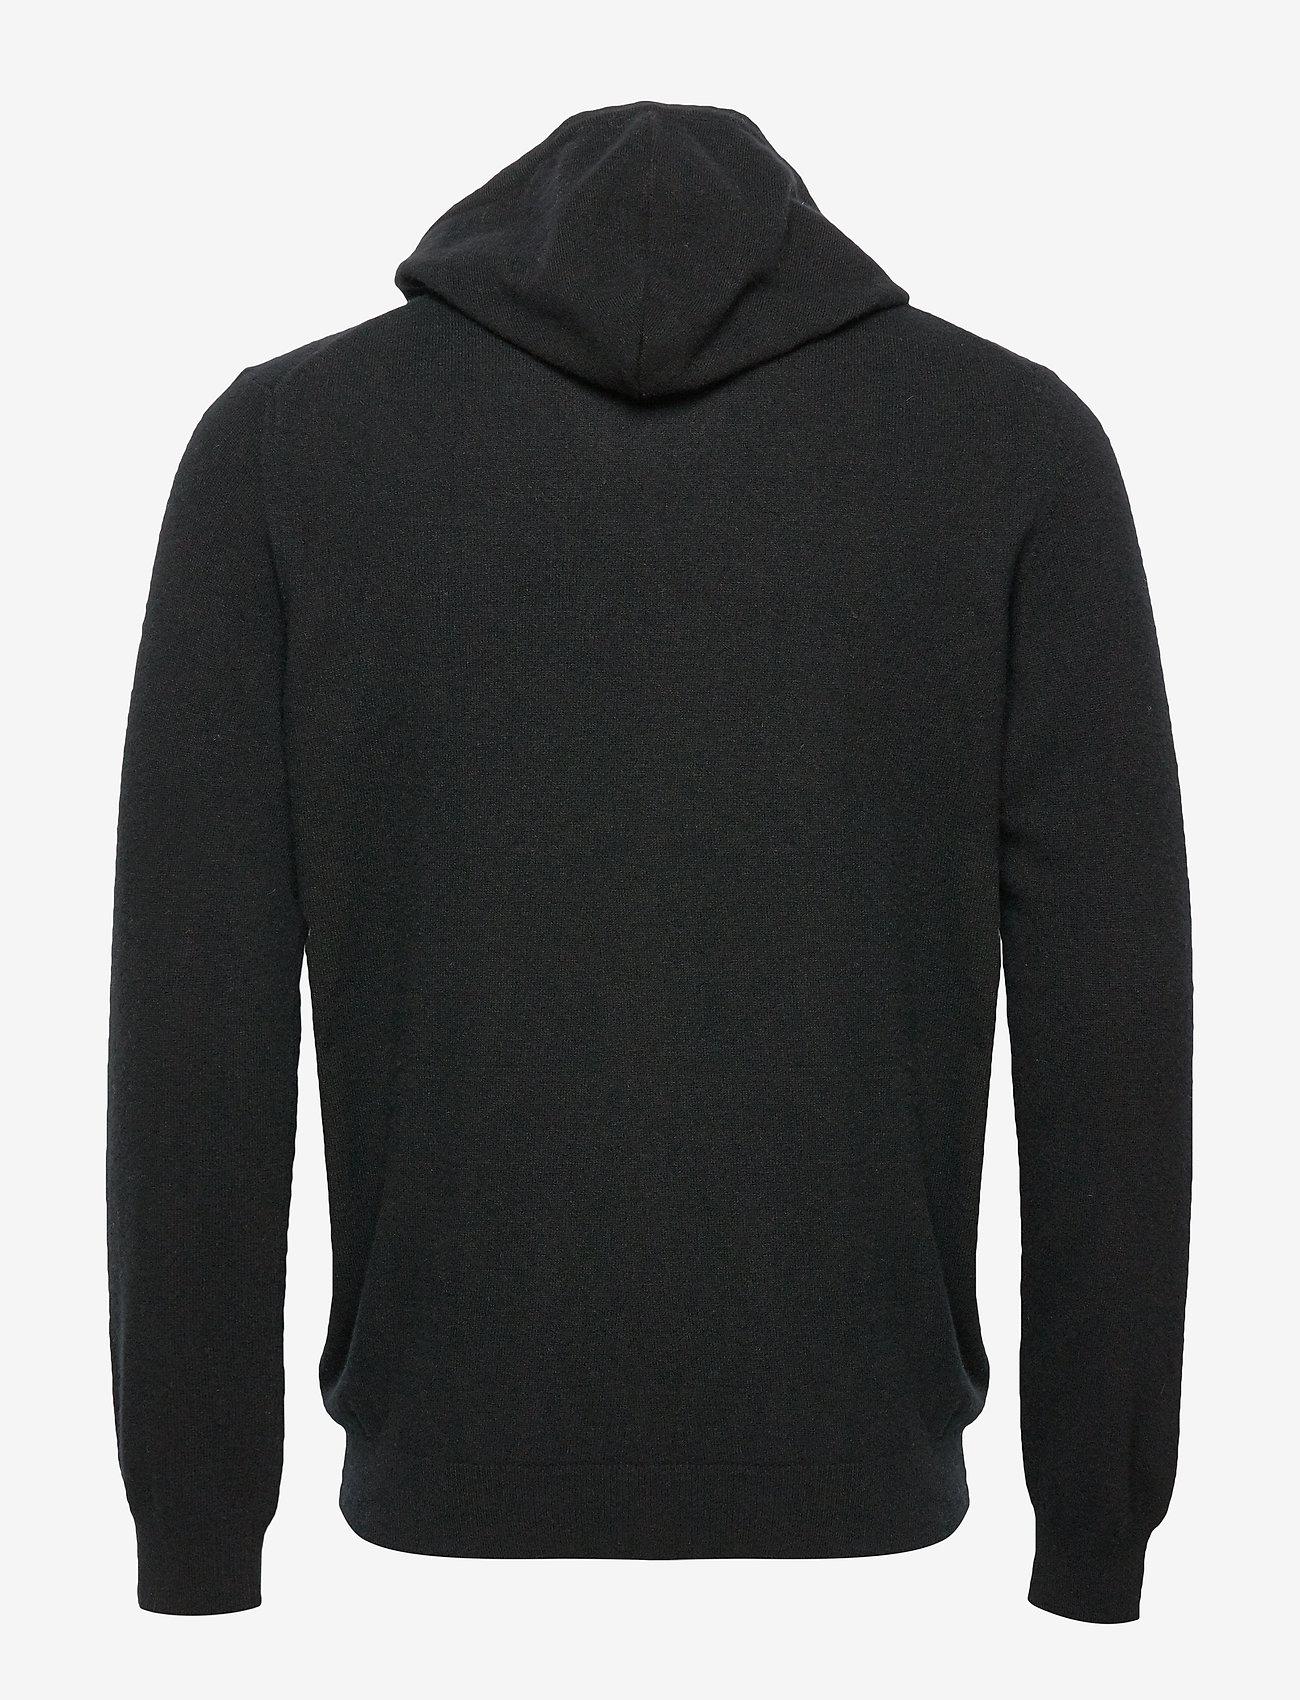 Oscar Jacobson Pascal Hoodie - Sweatshirts 310 Black